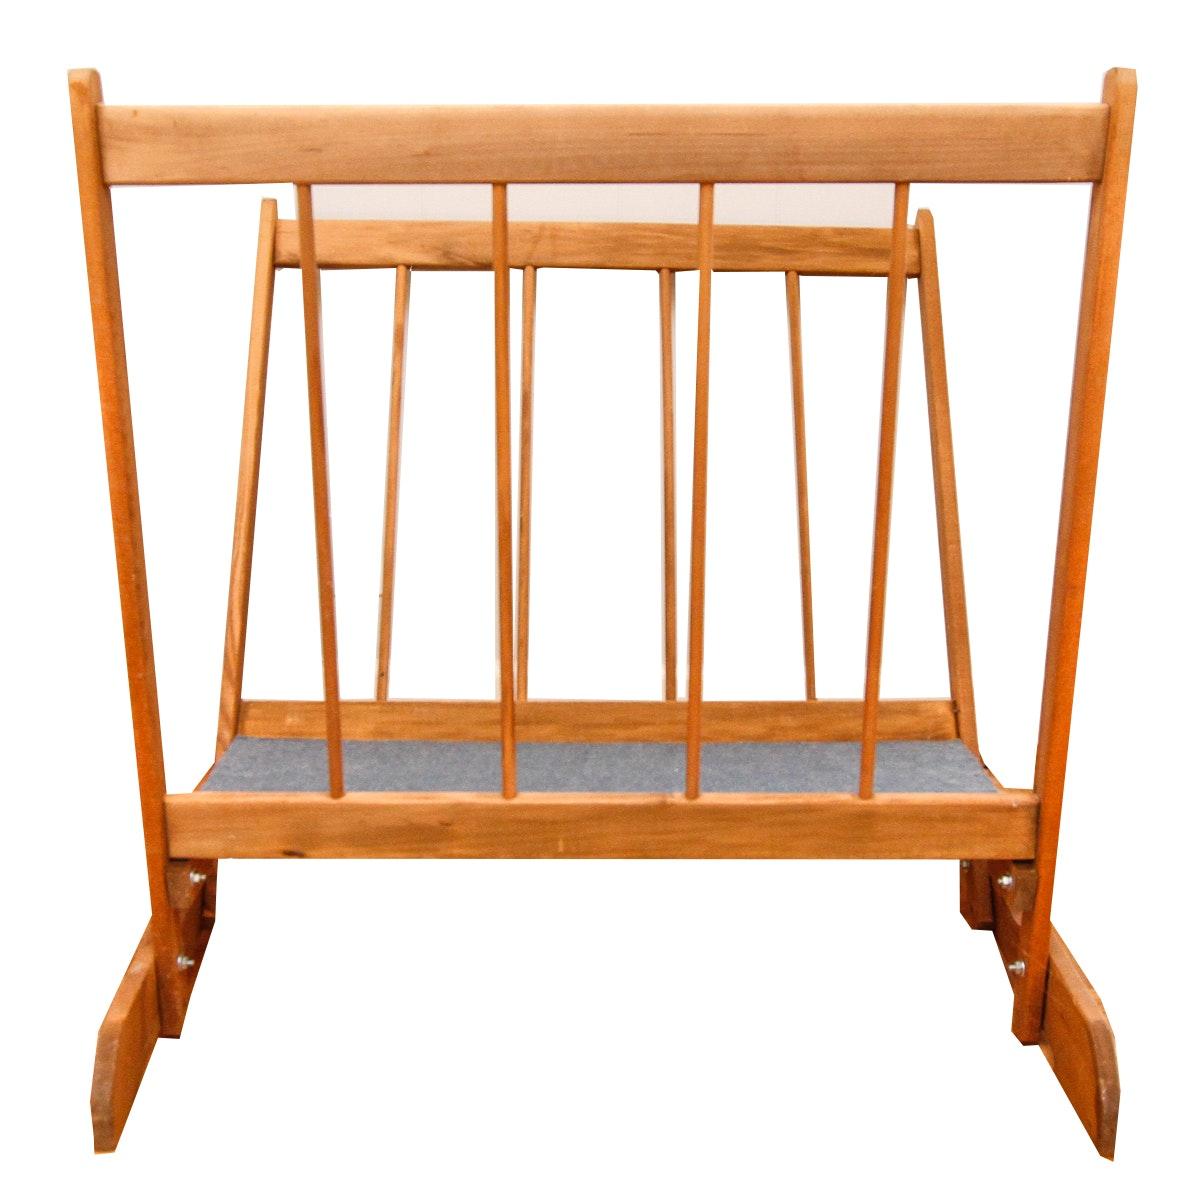 Wooden Art Print Rack